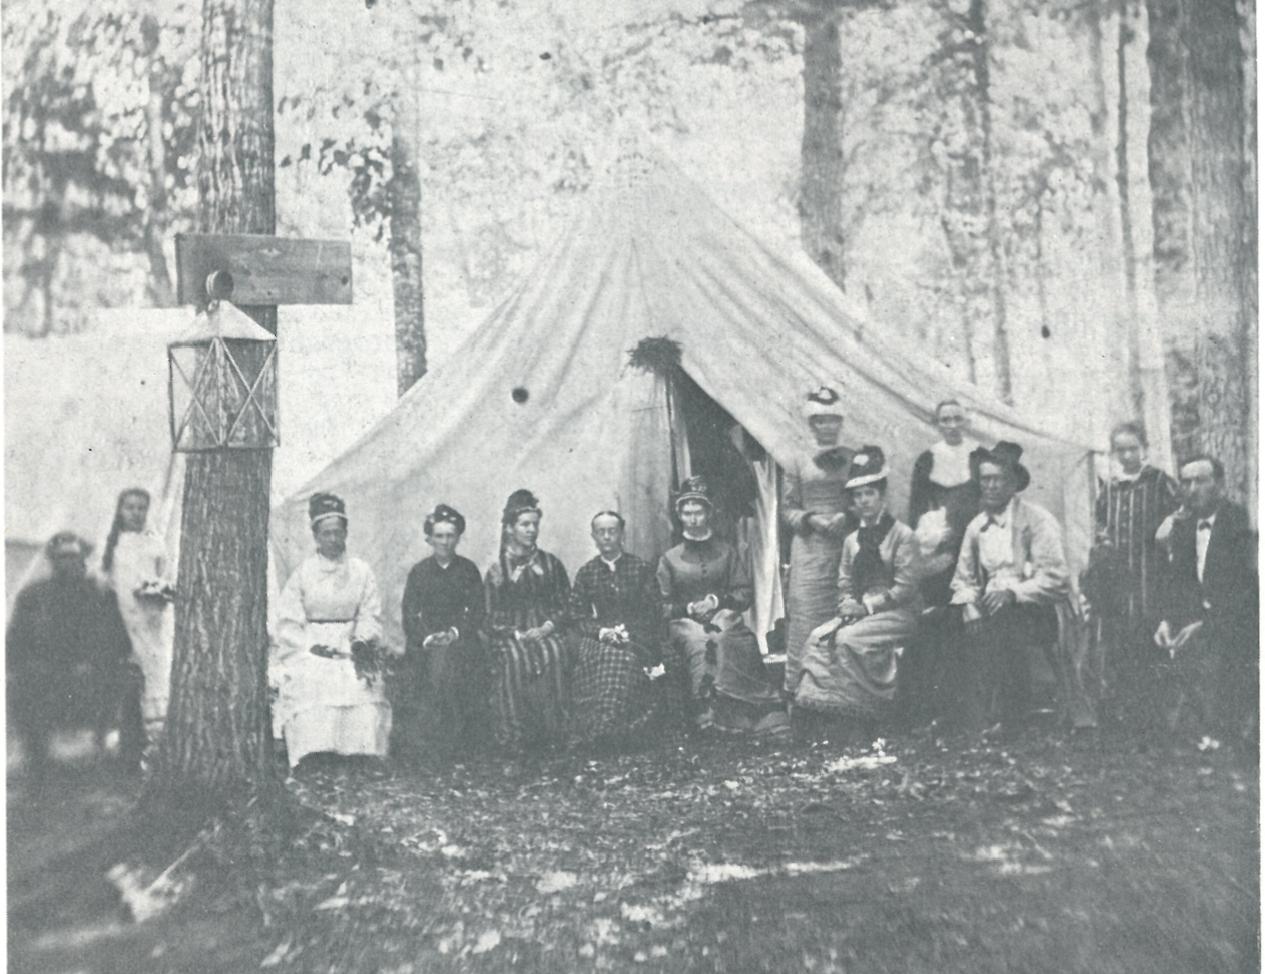 Platform Tent, near Morristown, NY